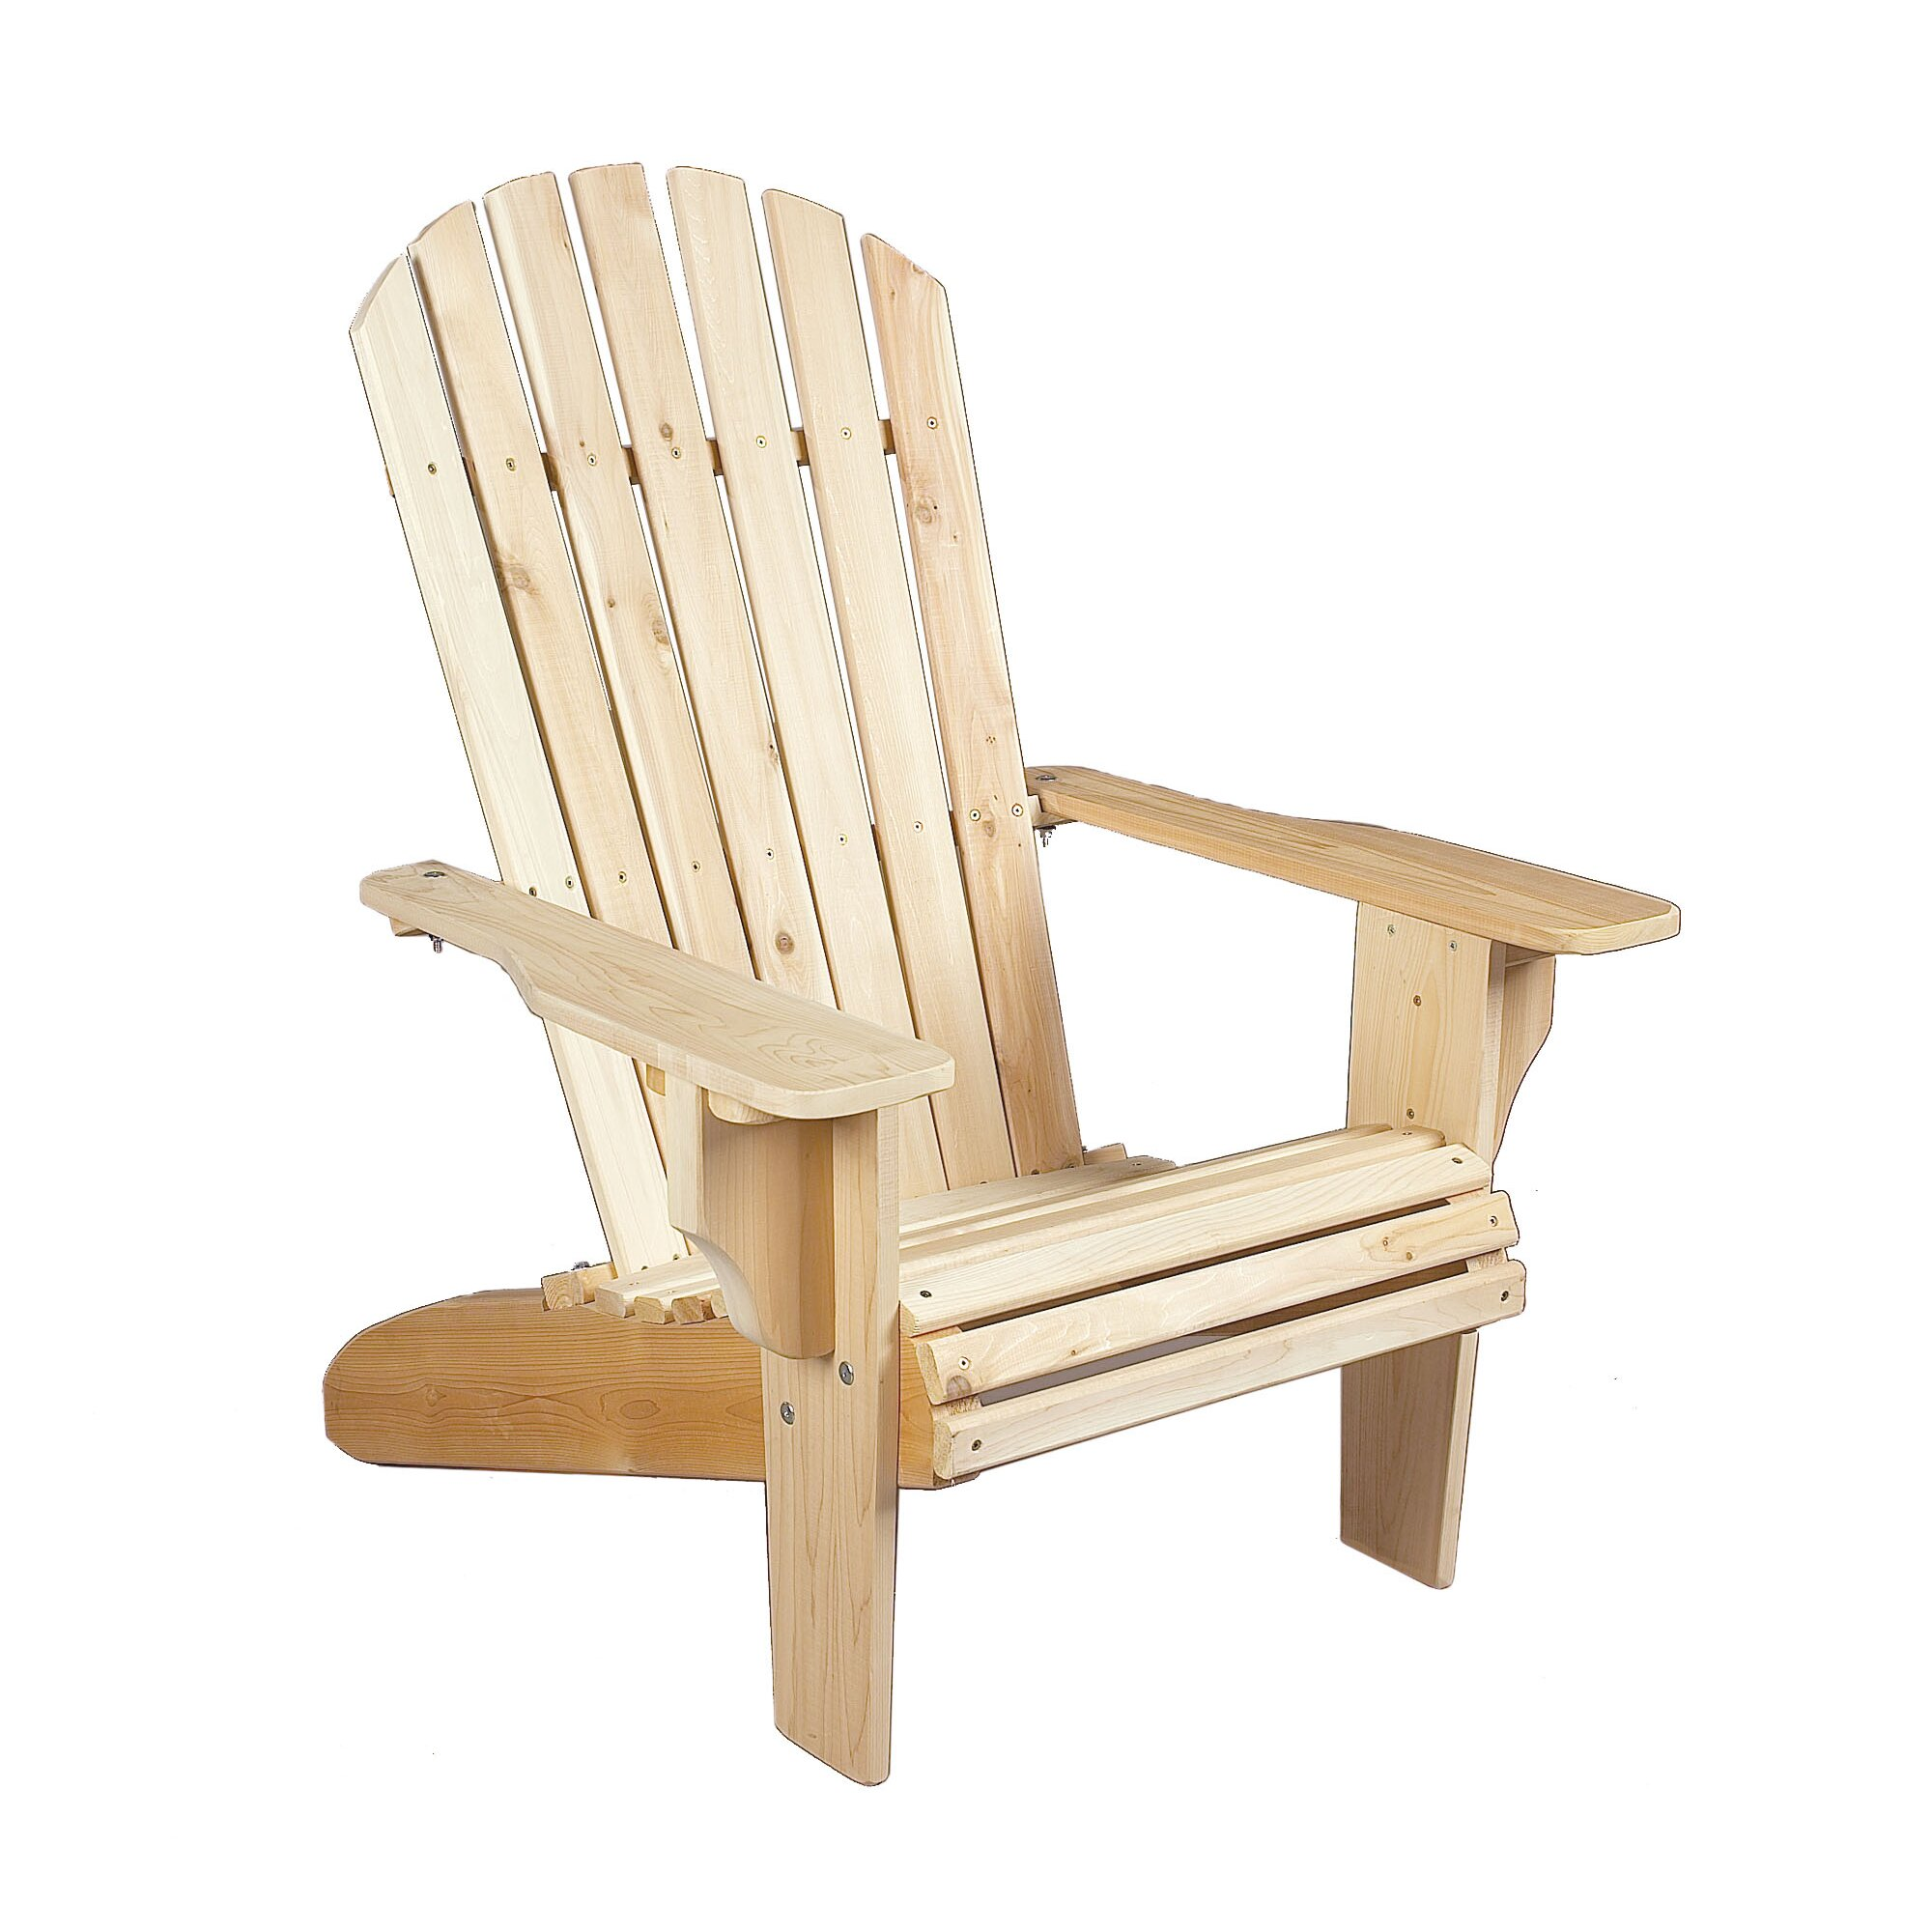 Rustic Cedar Deluxe Cedar Adirondack Chair Reviews Wayfair